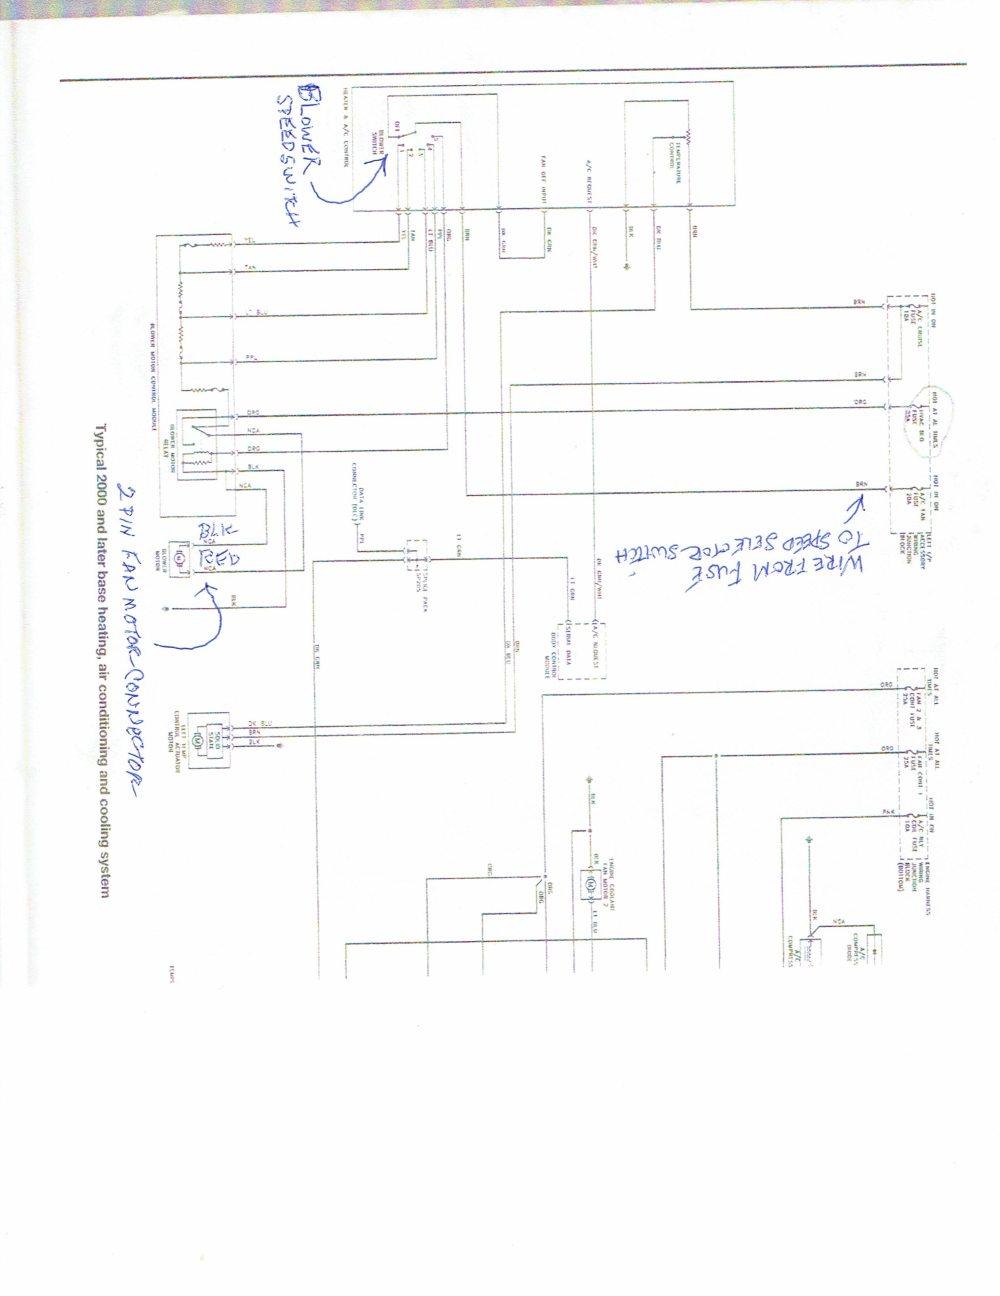 medium resolution of 93 chevy heater control wiring diagram 2008 chevy impala heater control wiring diagram